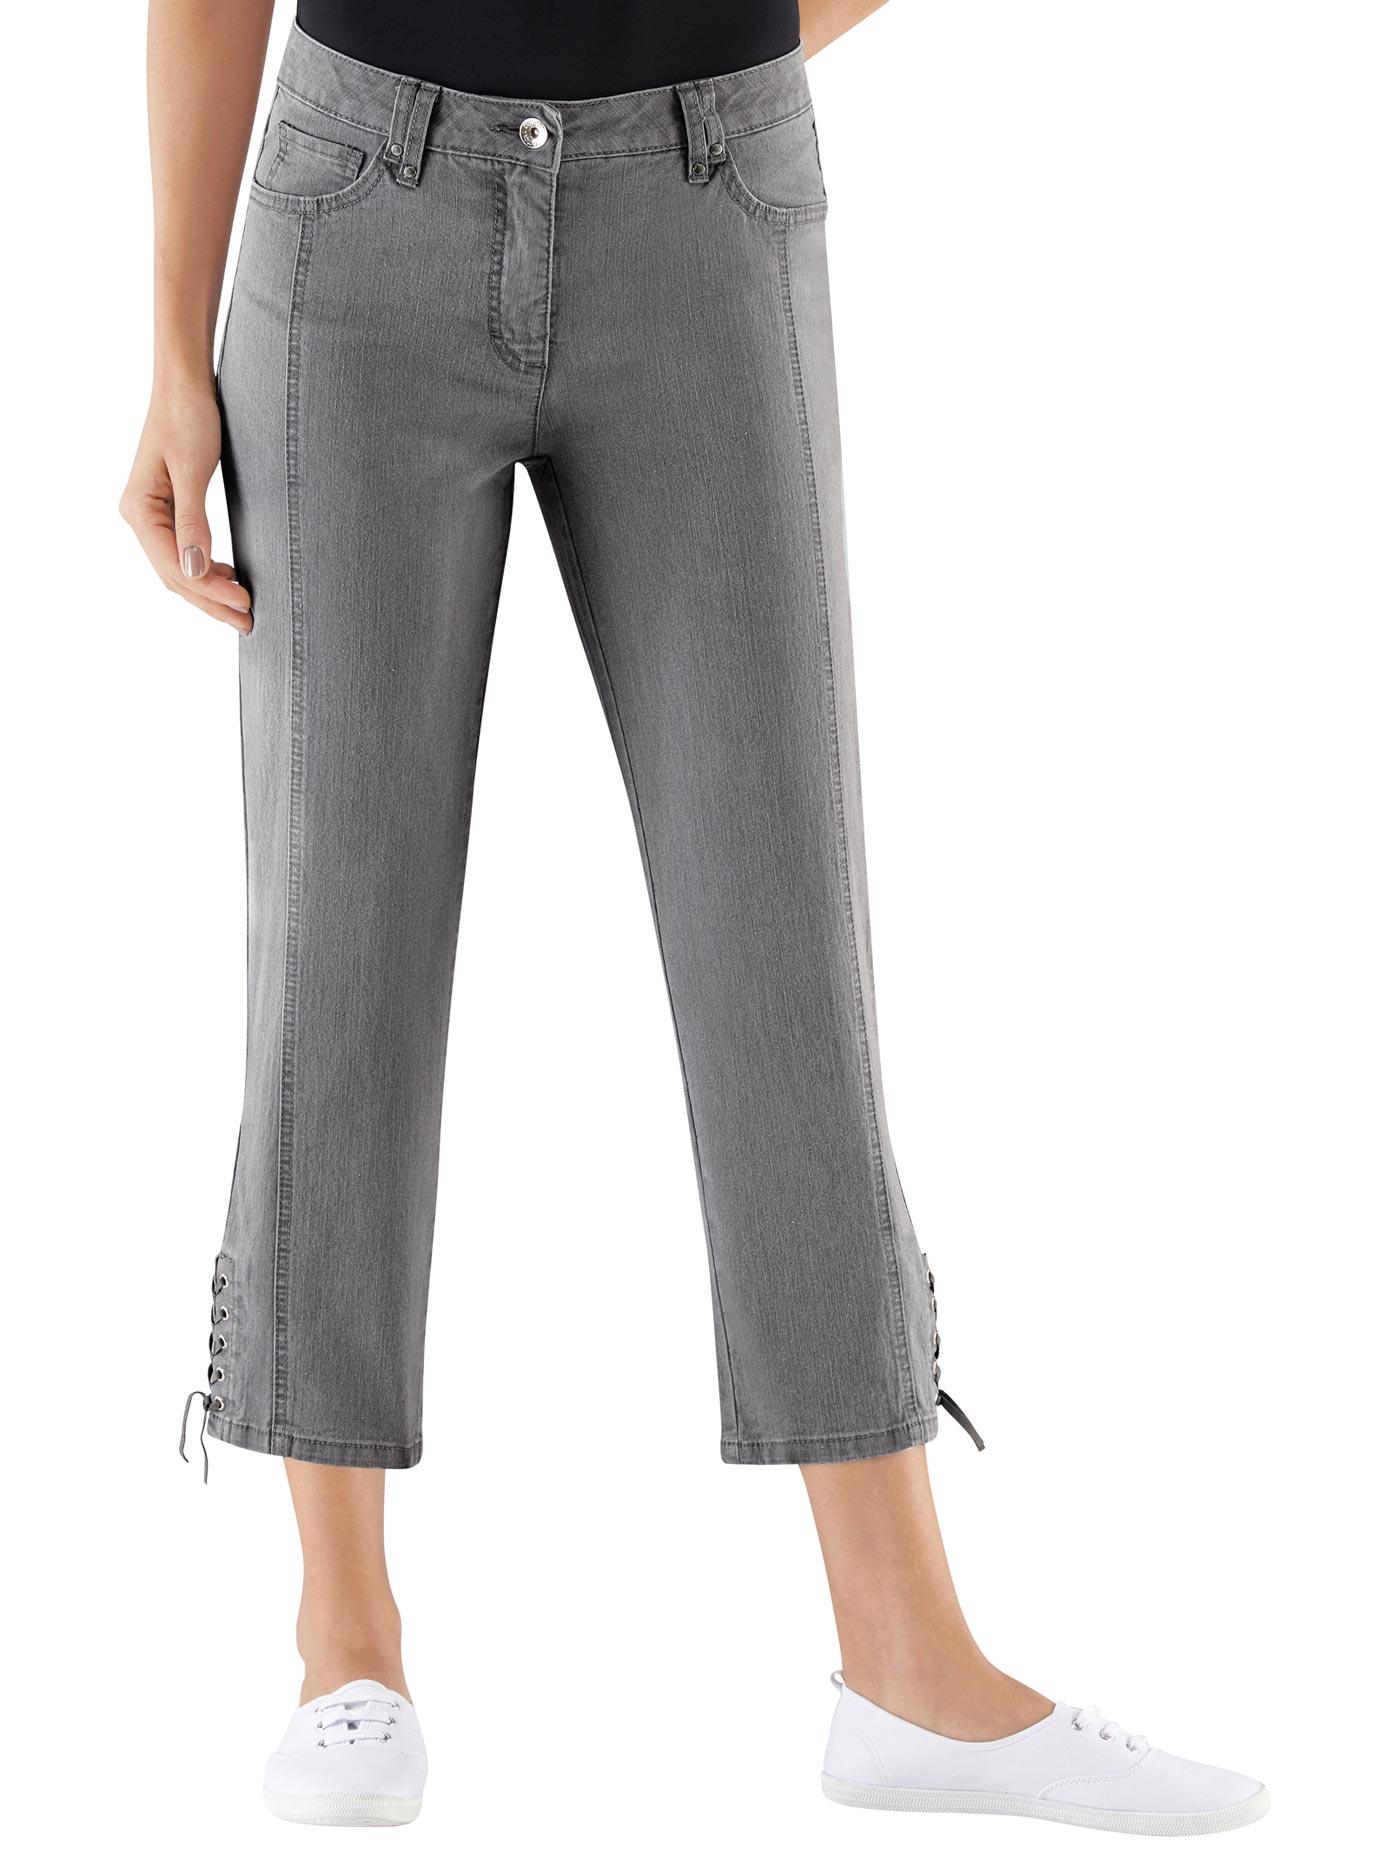 Casual Looks 7/8-Jeans mit Ziernähten | Bekleidung > Jeans > 7/8-Jeans | Casual Looks